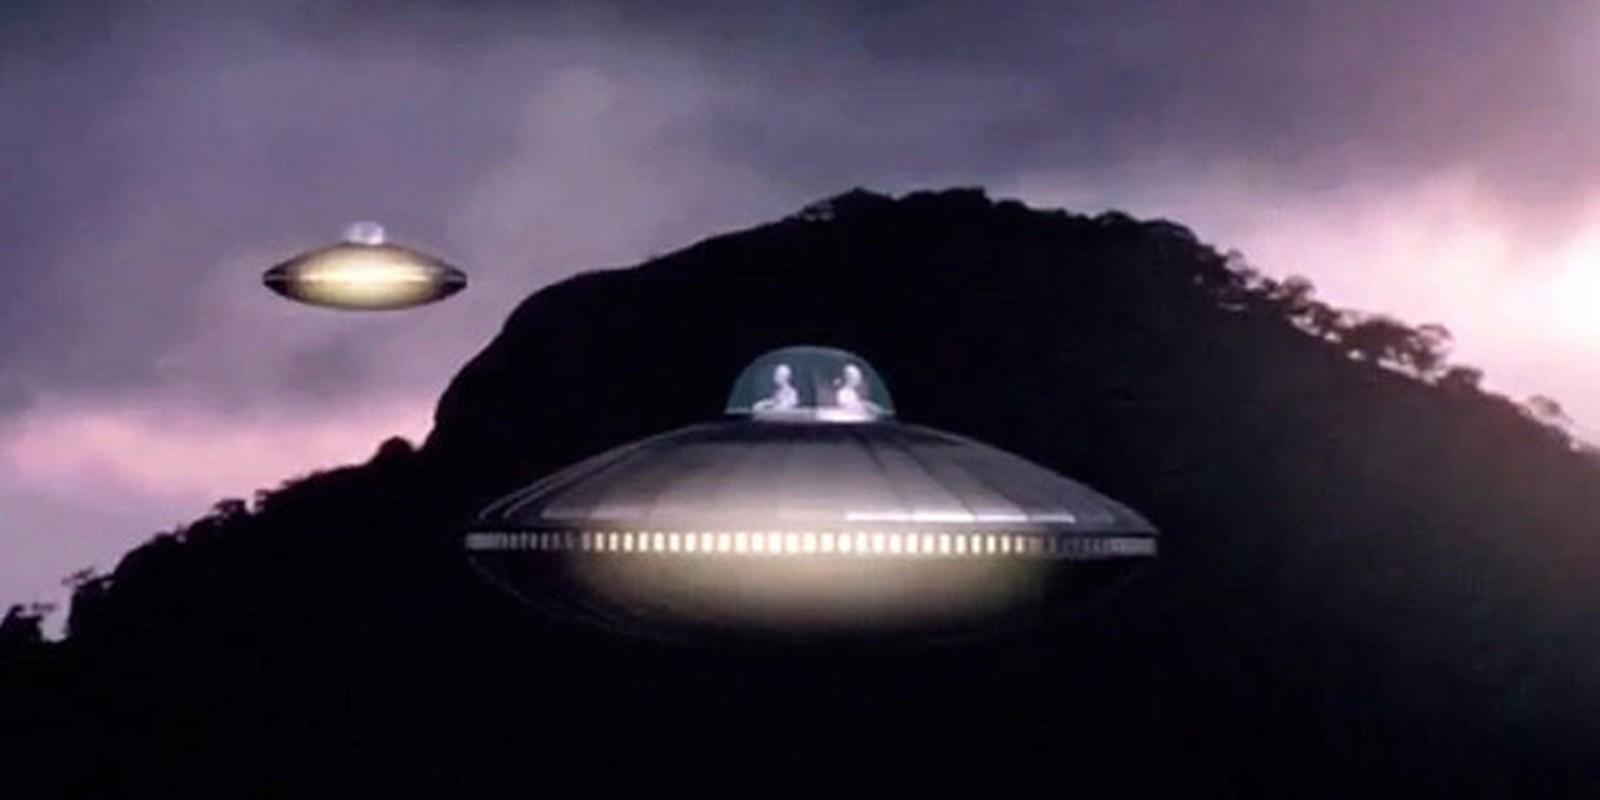 He lo gay soc: CIA tung dieu tra ve UFO tu hon 50 nam truoc-Hinh-8